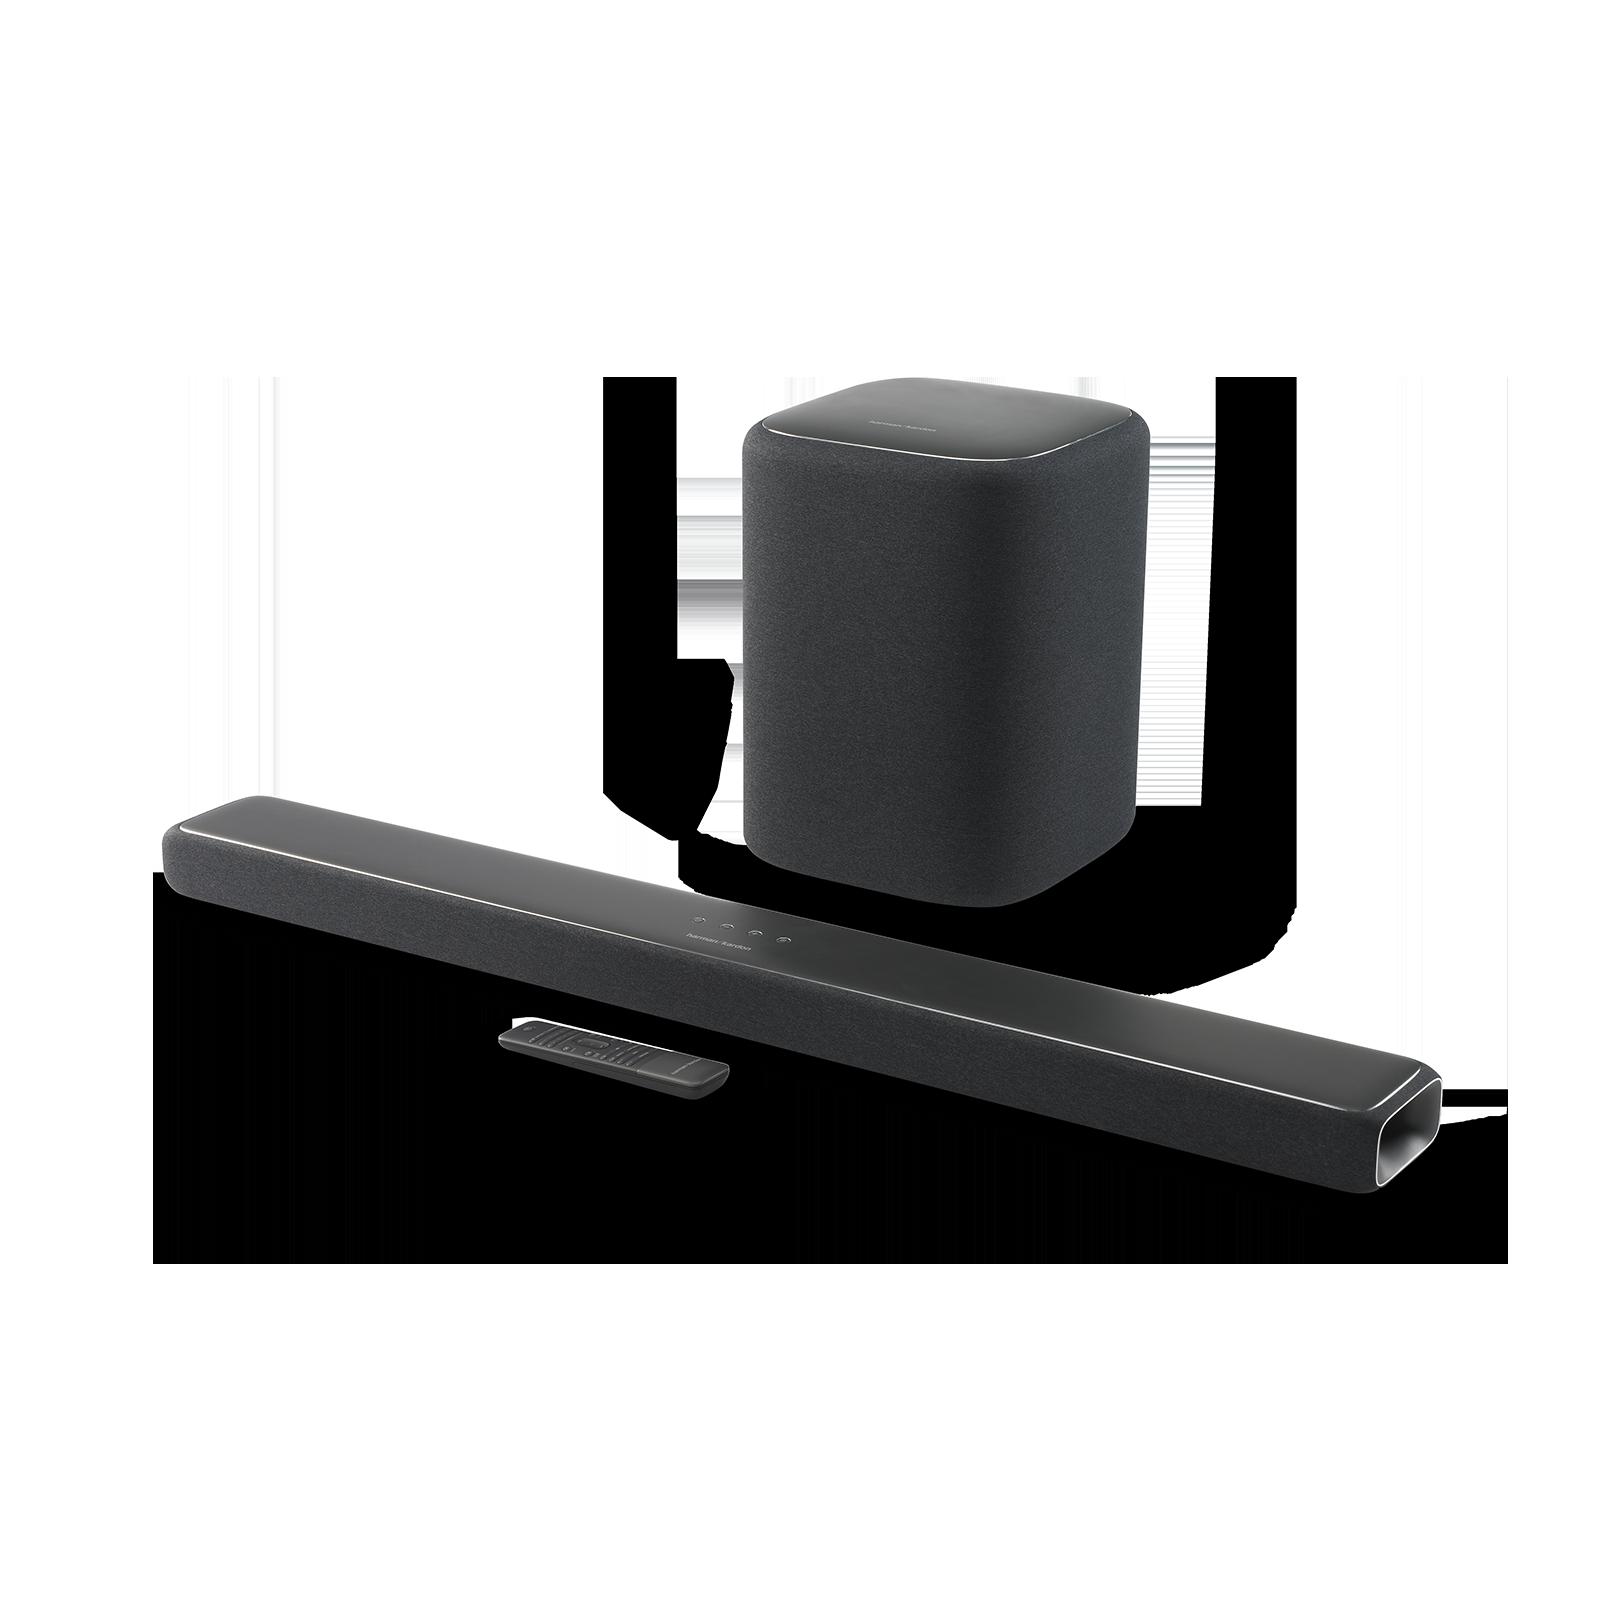 Enchant 1300 - Graphite - All in One 13-Channel Soundbar with MultiBeam™ Surround Sound - Detailshot 3